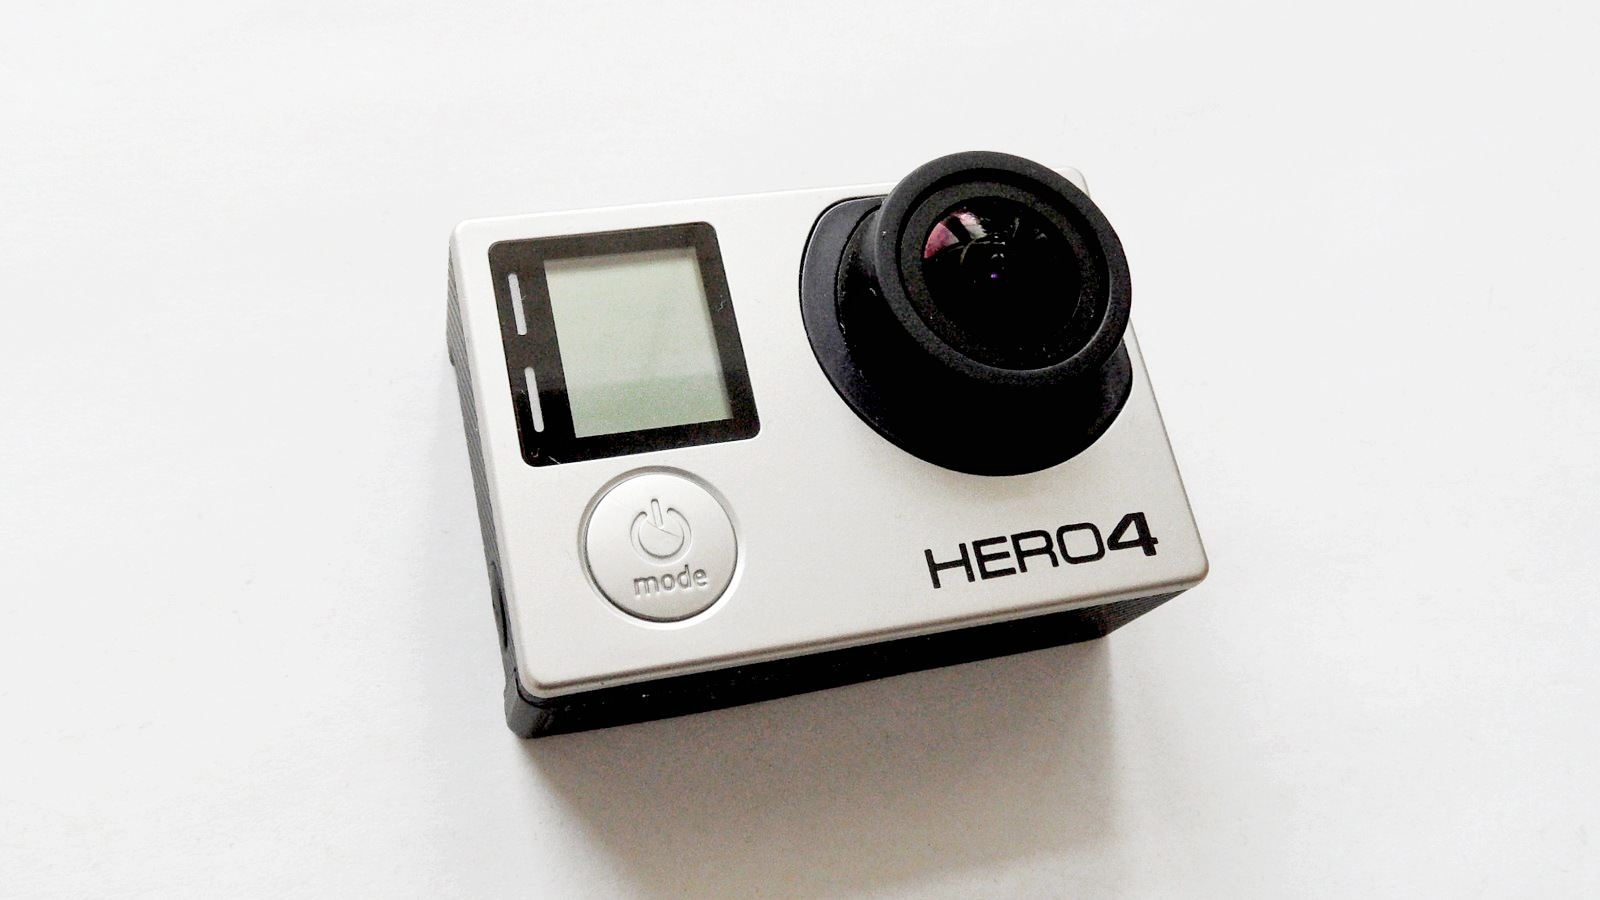 Gopro Hero 4 Black Najlepsza Kamera Sportowa Allegro Pl